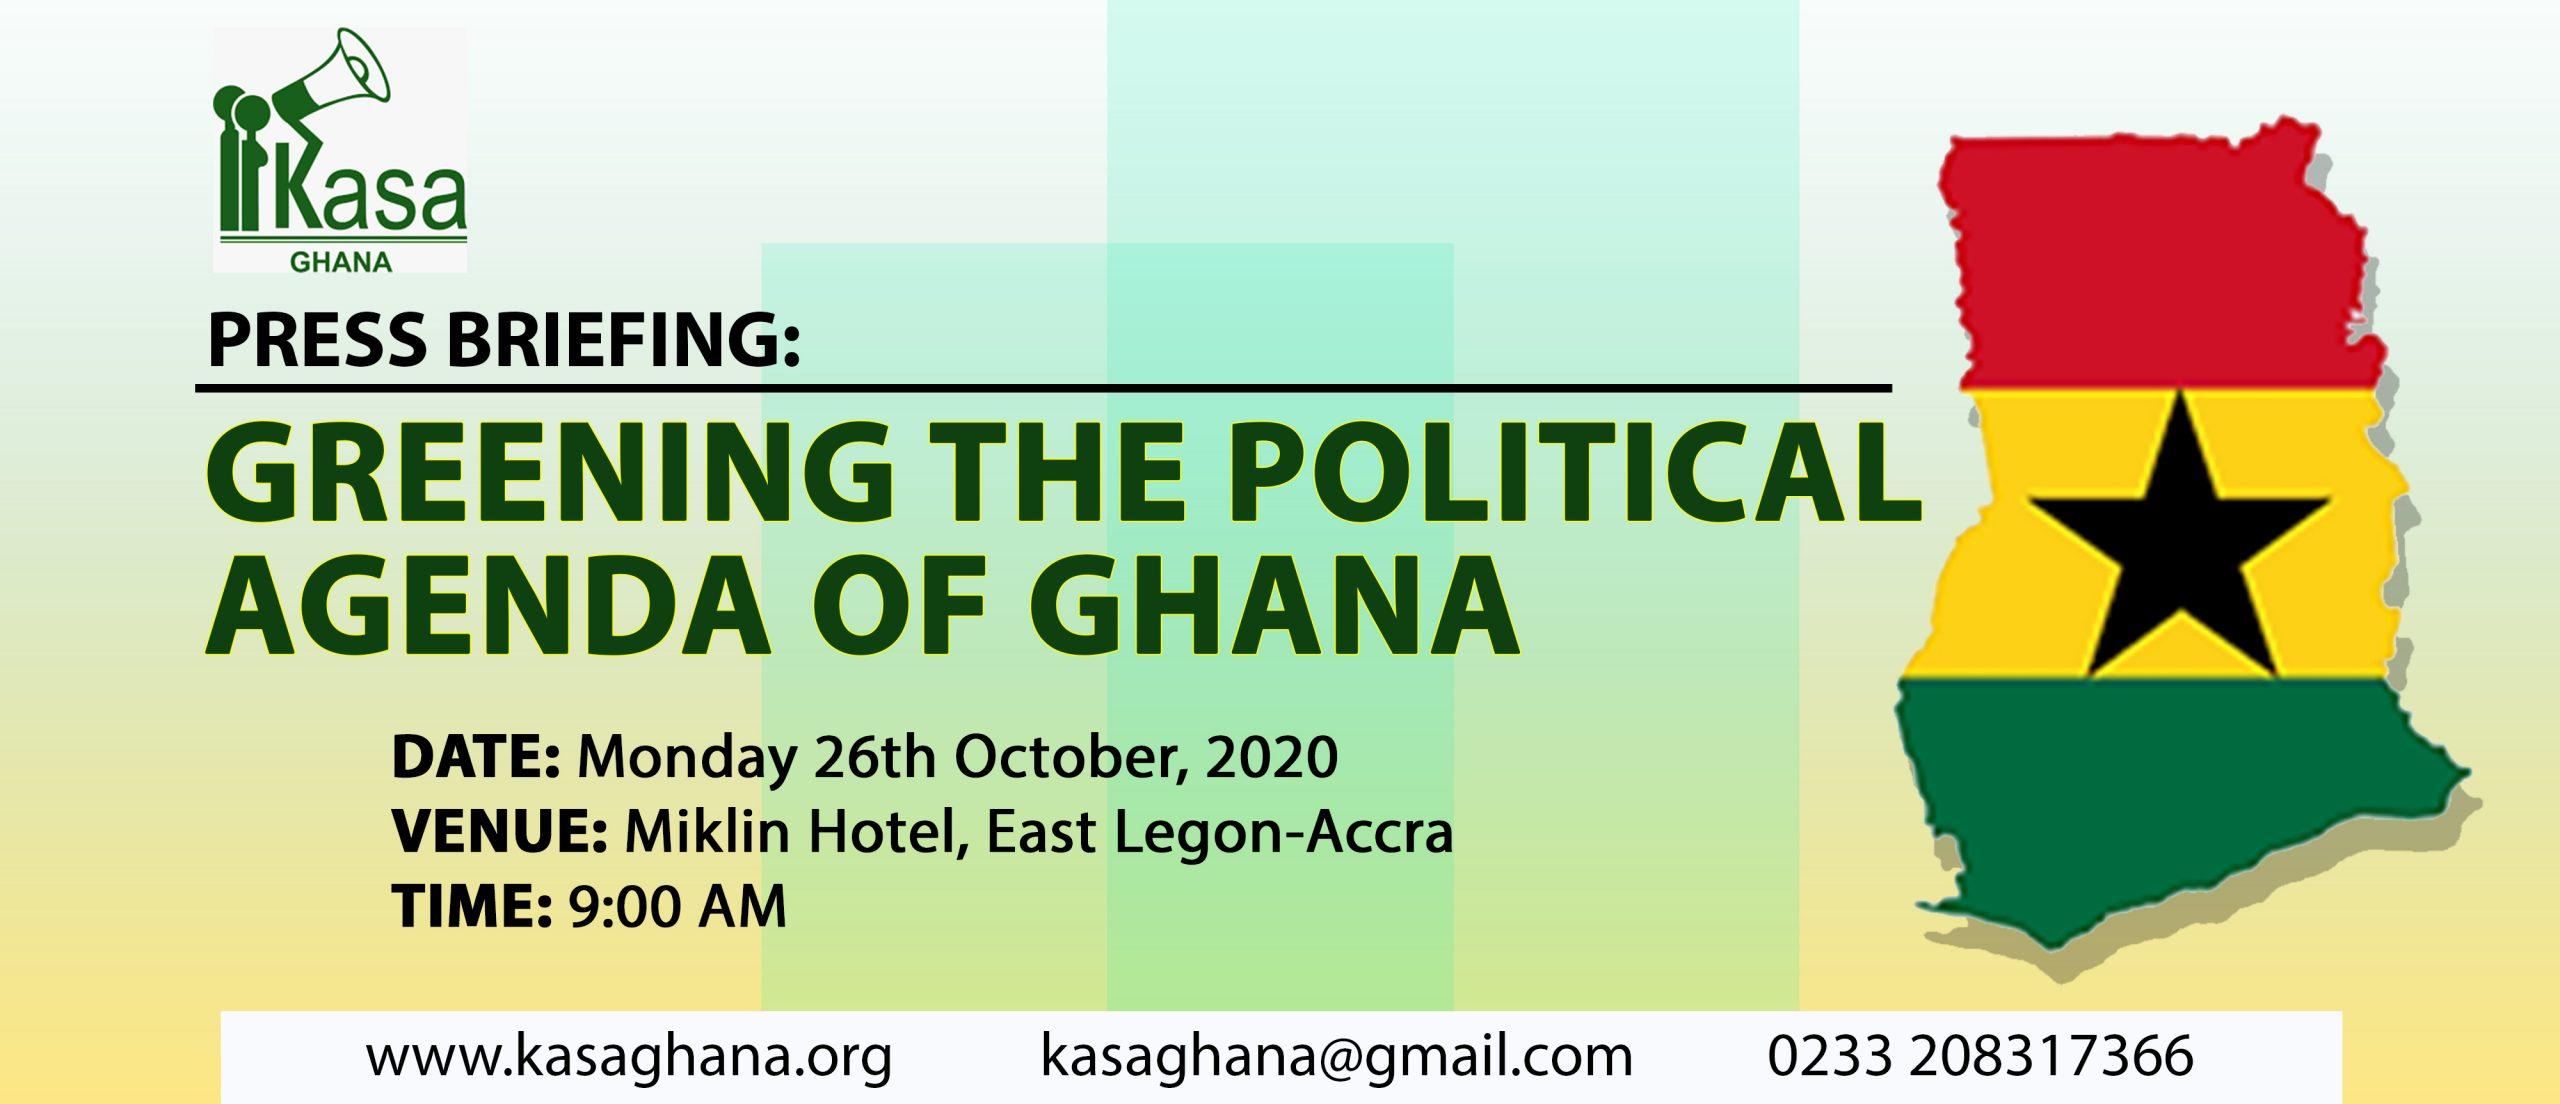 Greening the political agenda of Ghana